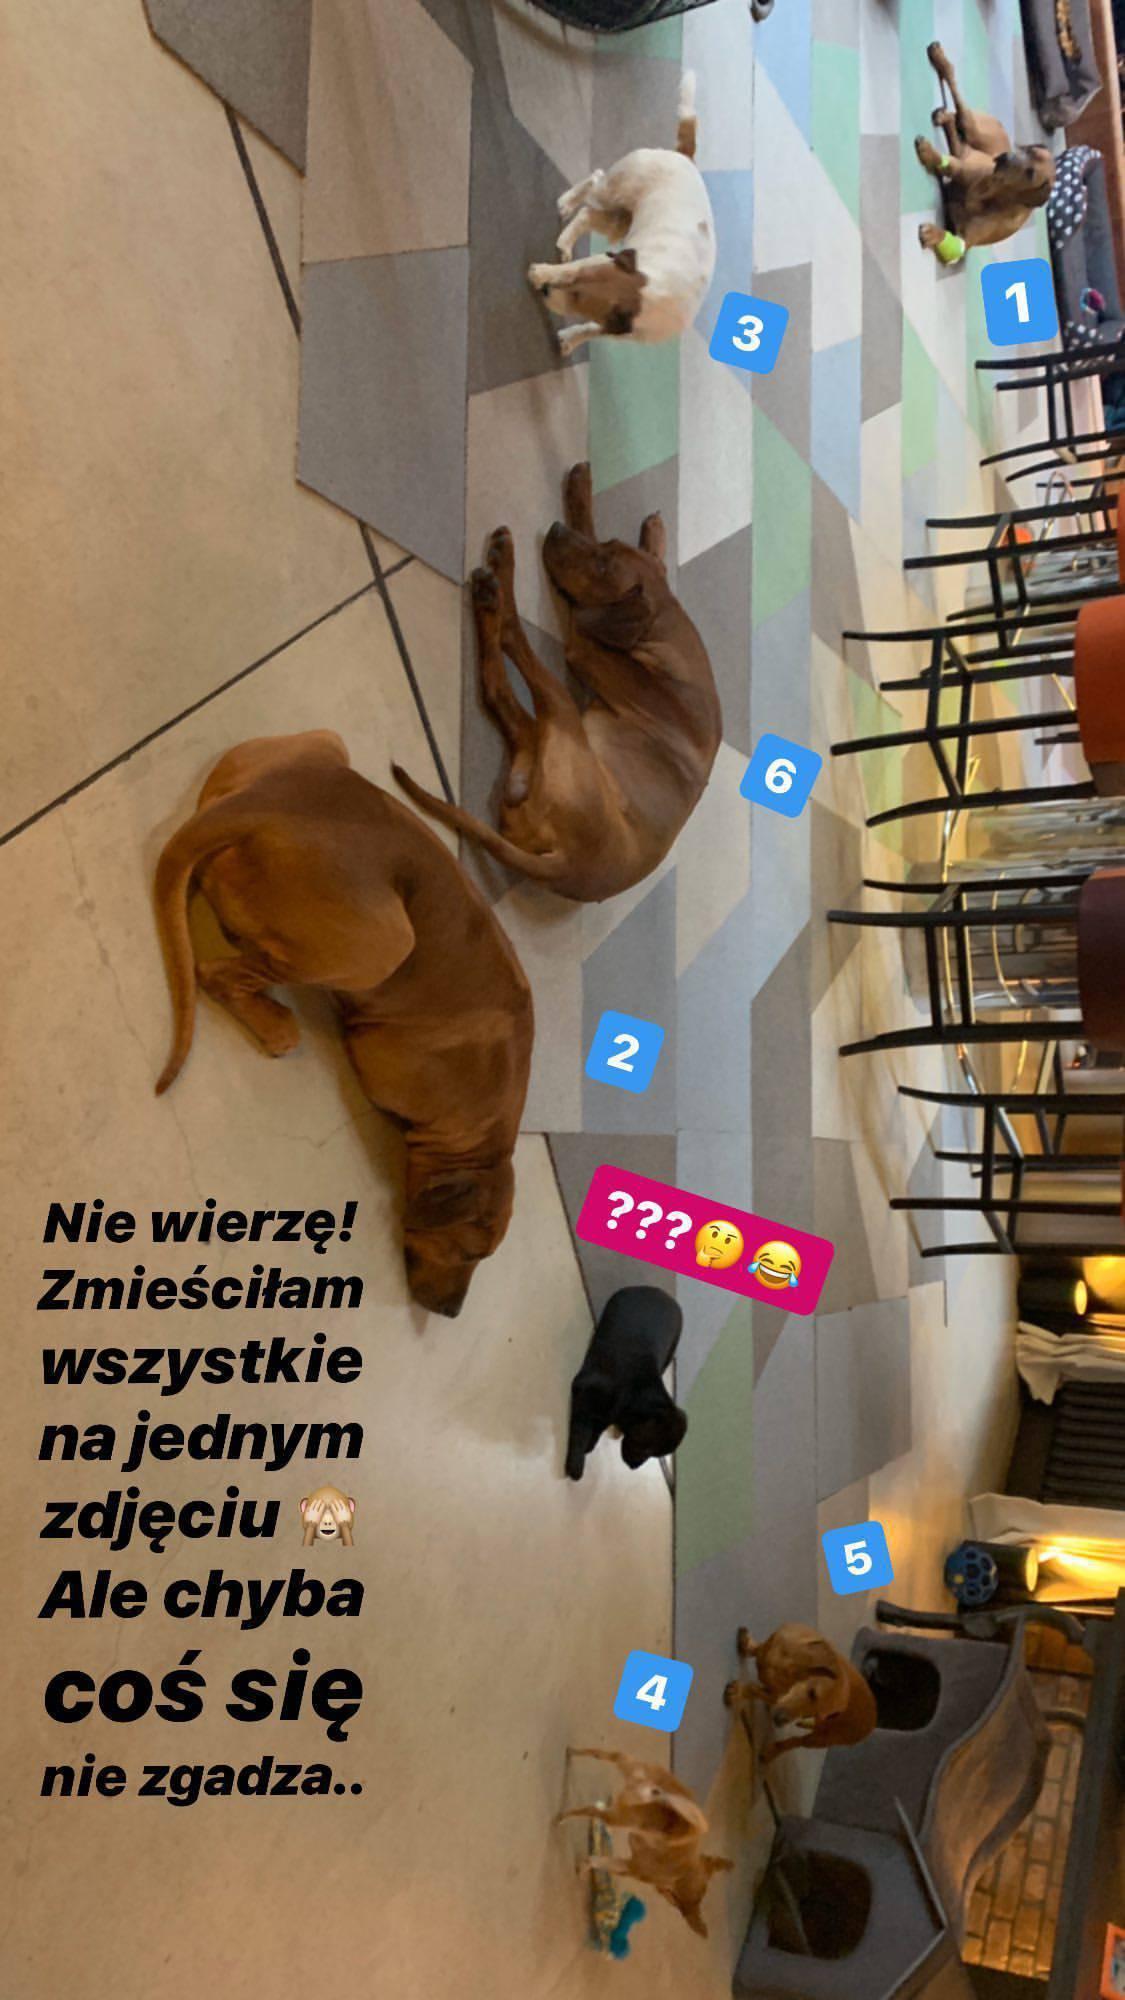 Agnieszka Woźniak-Starak - 7. pies